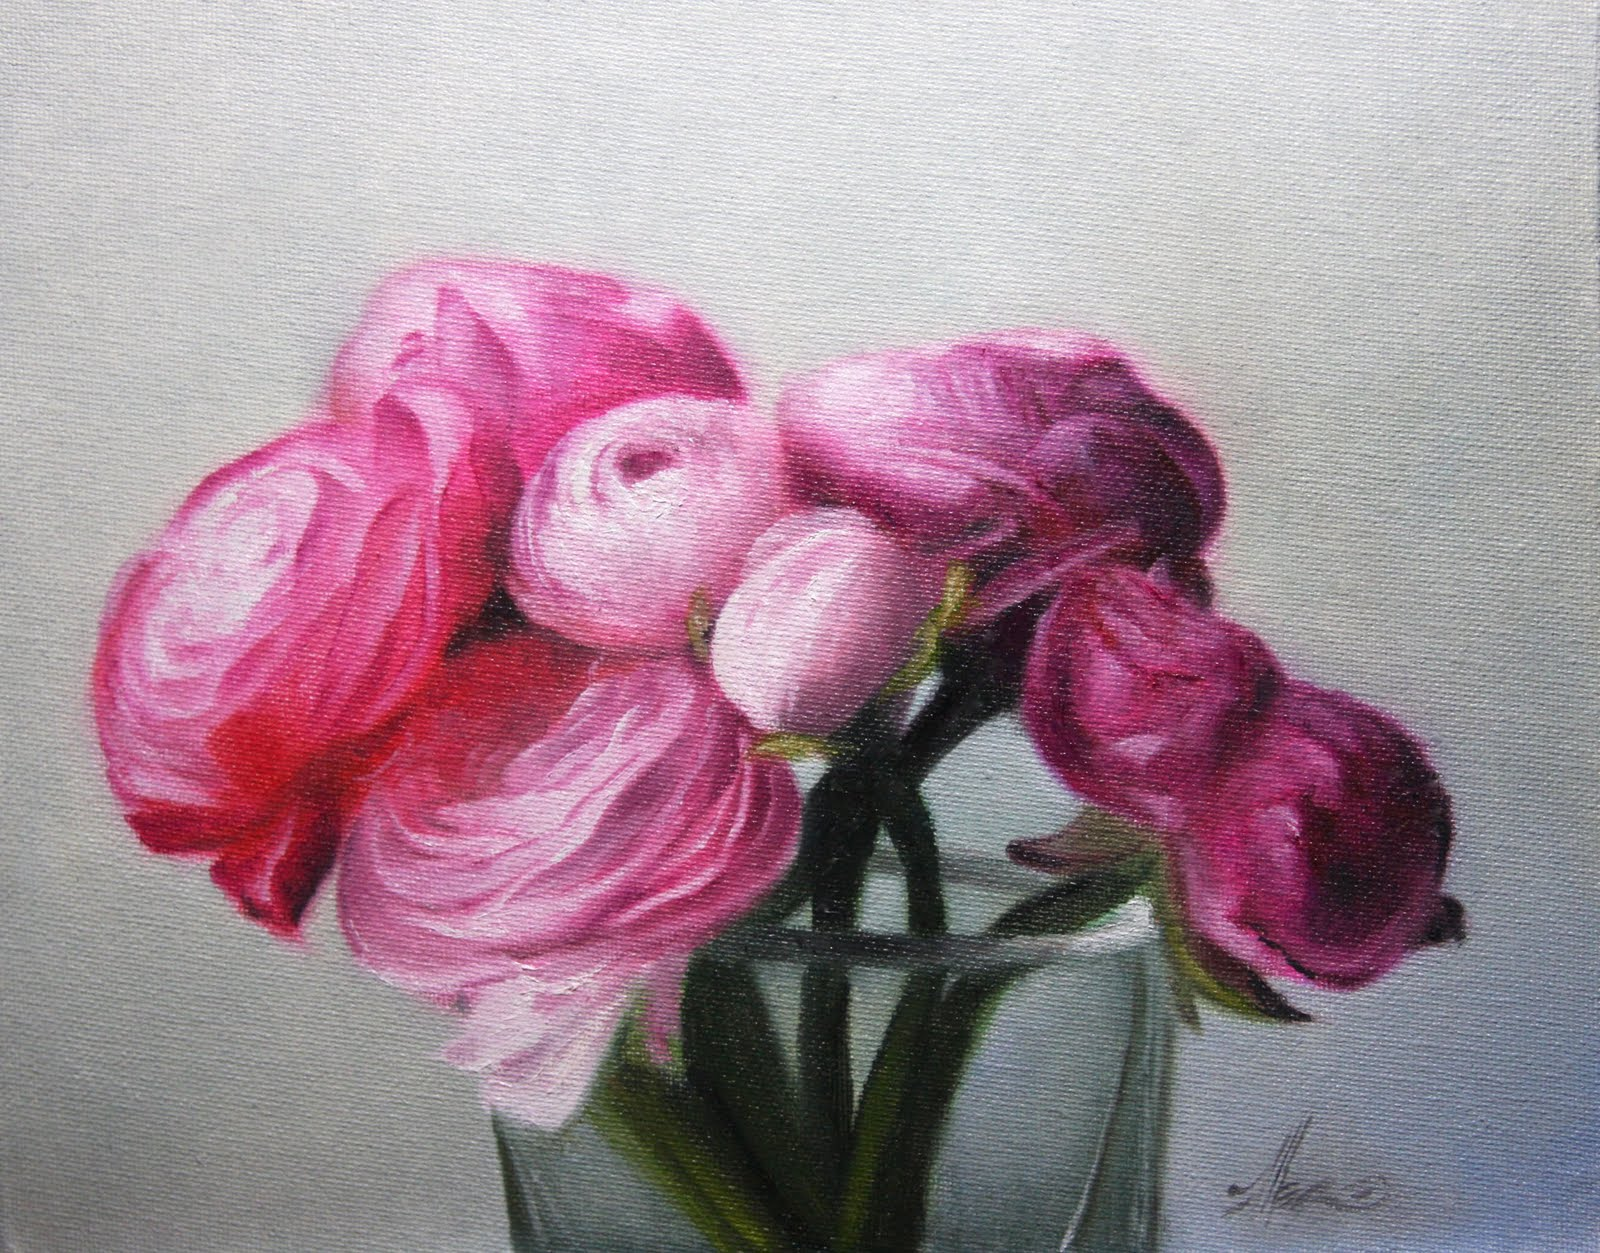 """Ranunculus 2"" original fine art by Jonathan Aller"